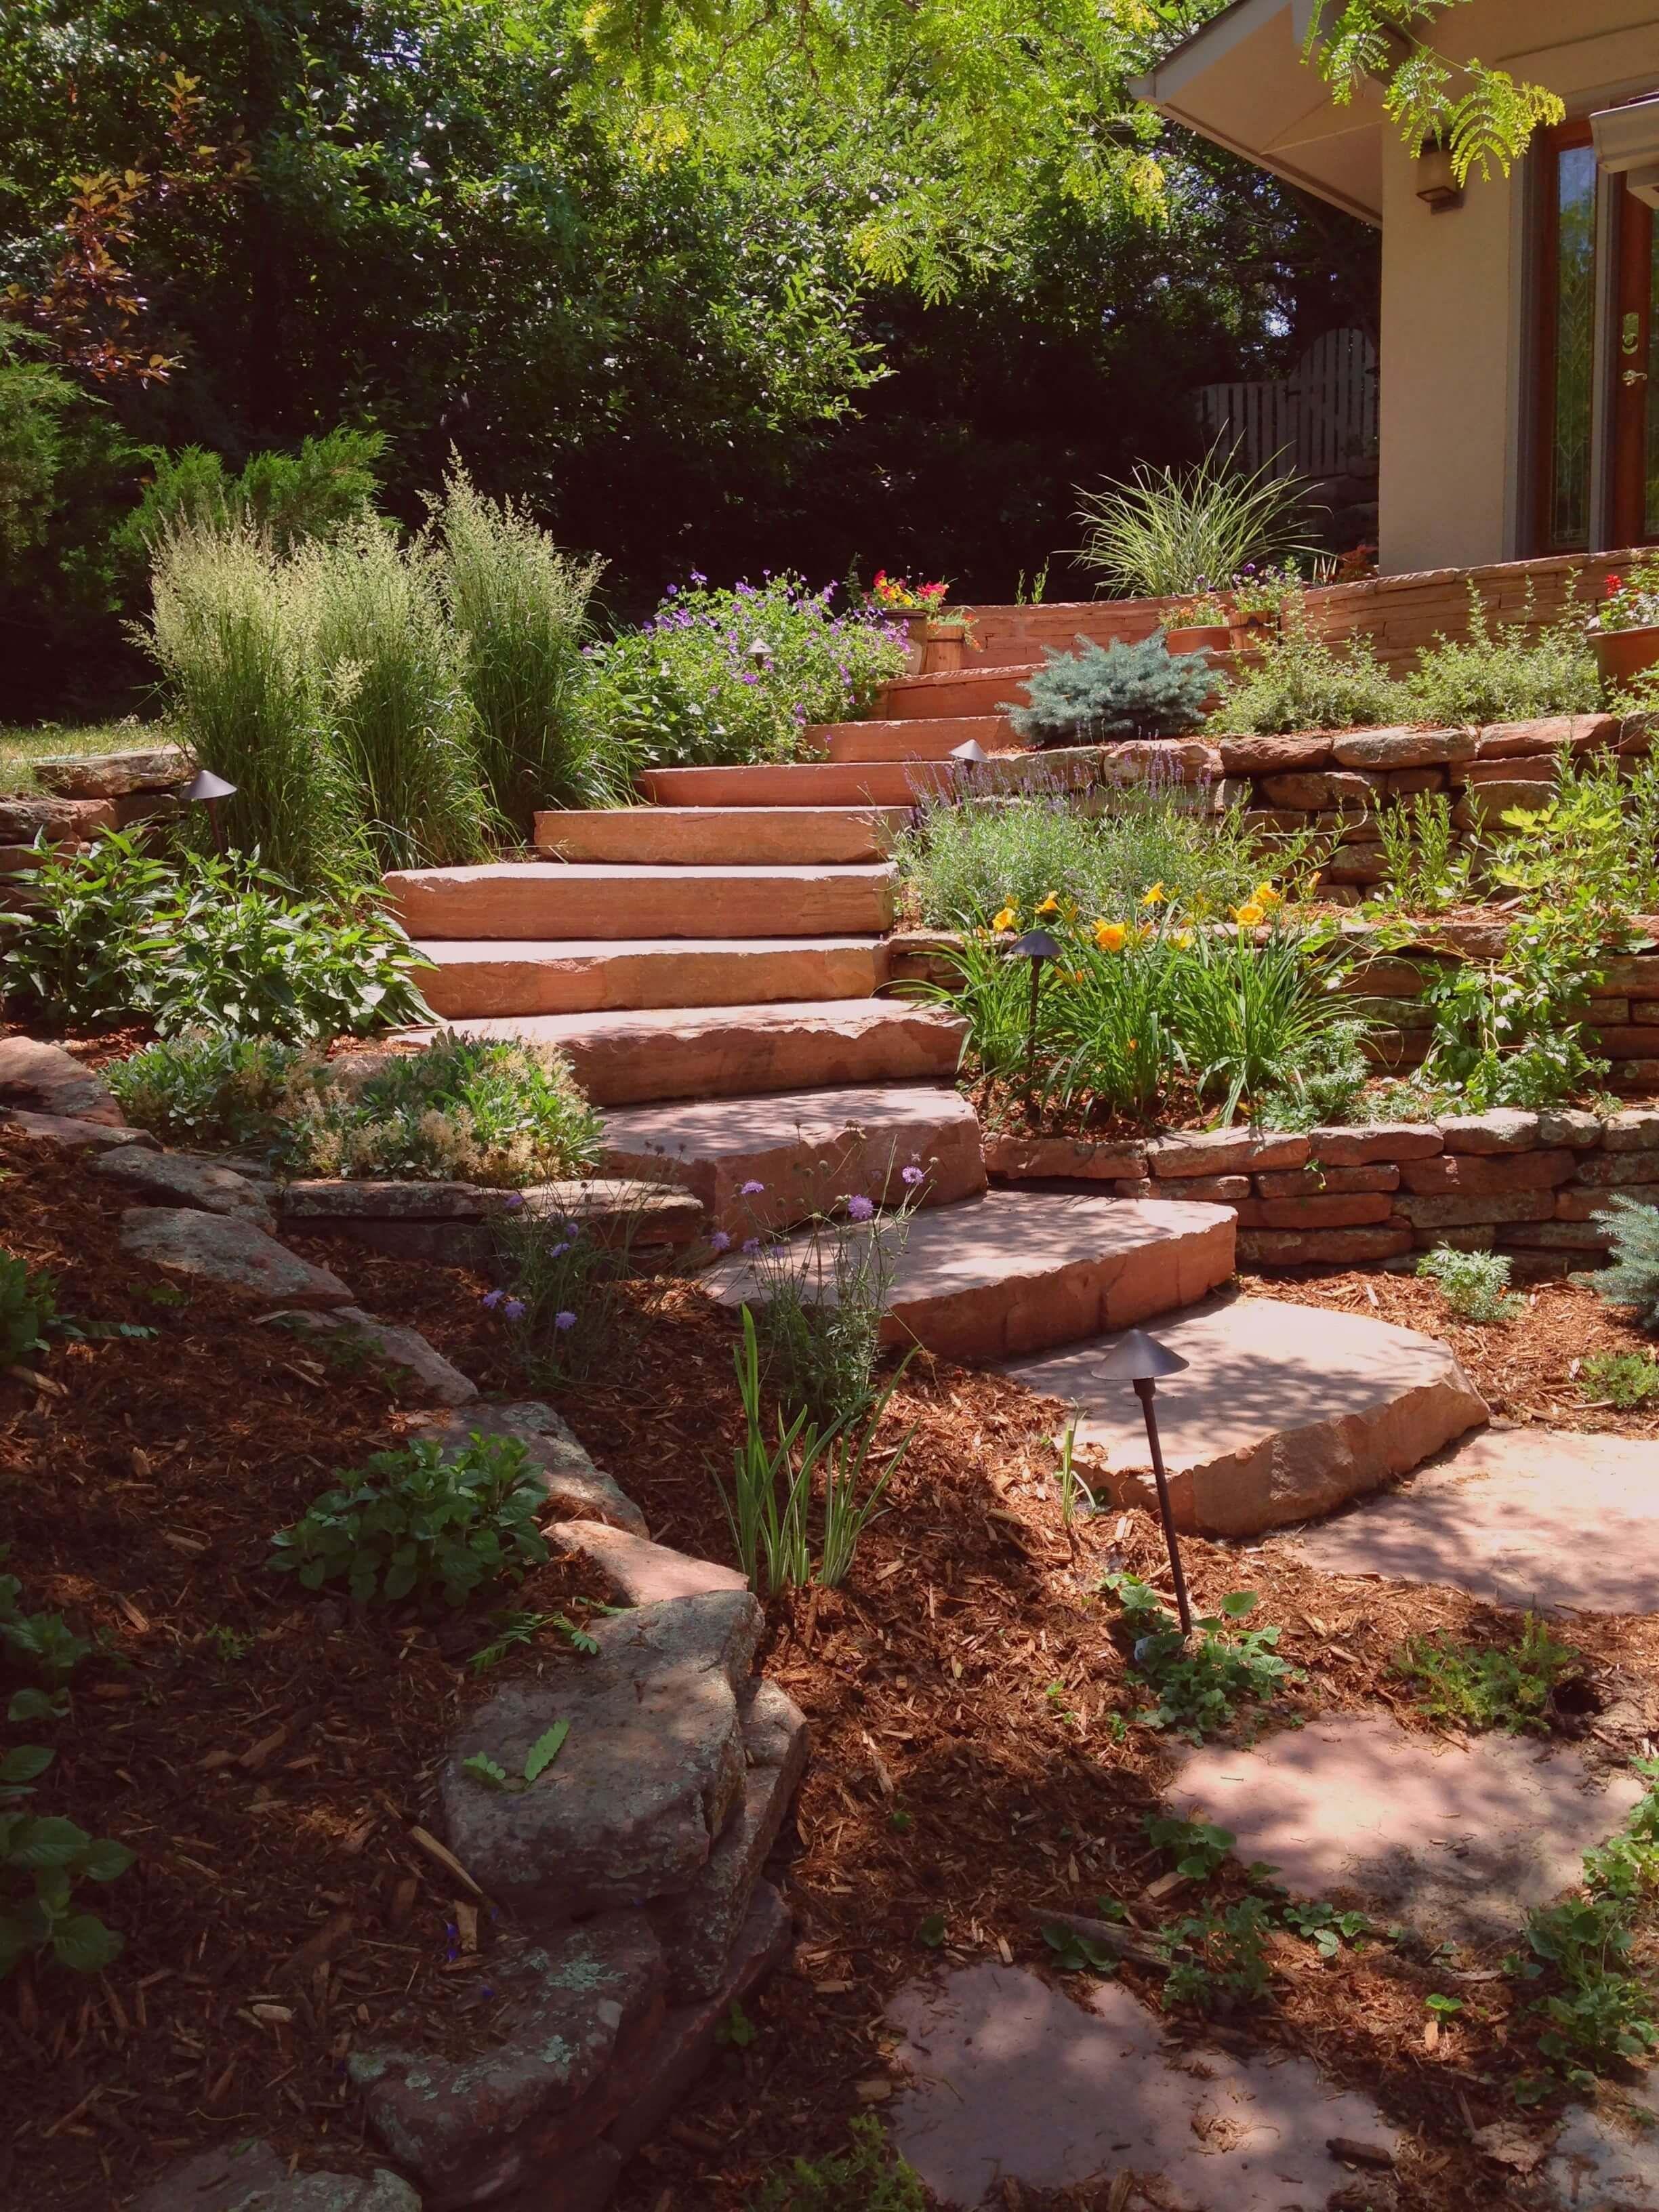 Pin By Online Landscape Designs On Landscapes And Gardens Online Landscape Design Landscape Design Services Front Yard Landscaping Design